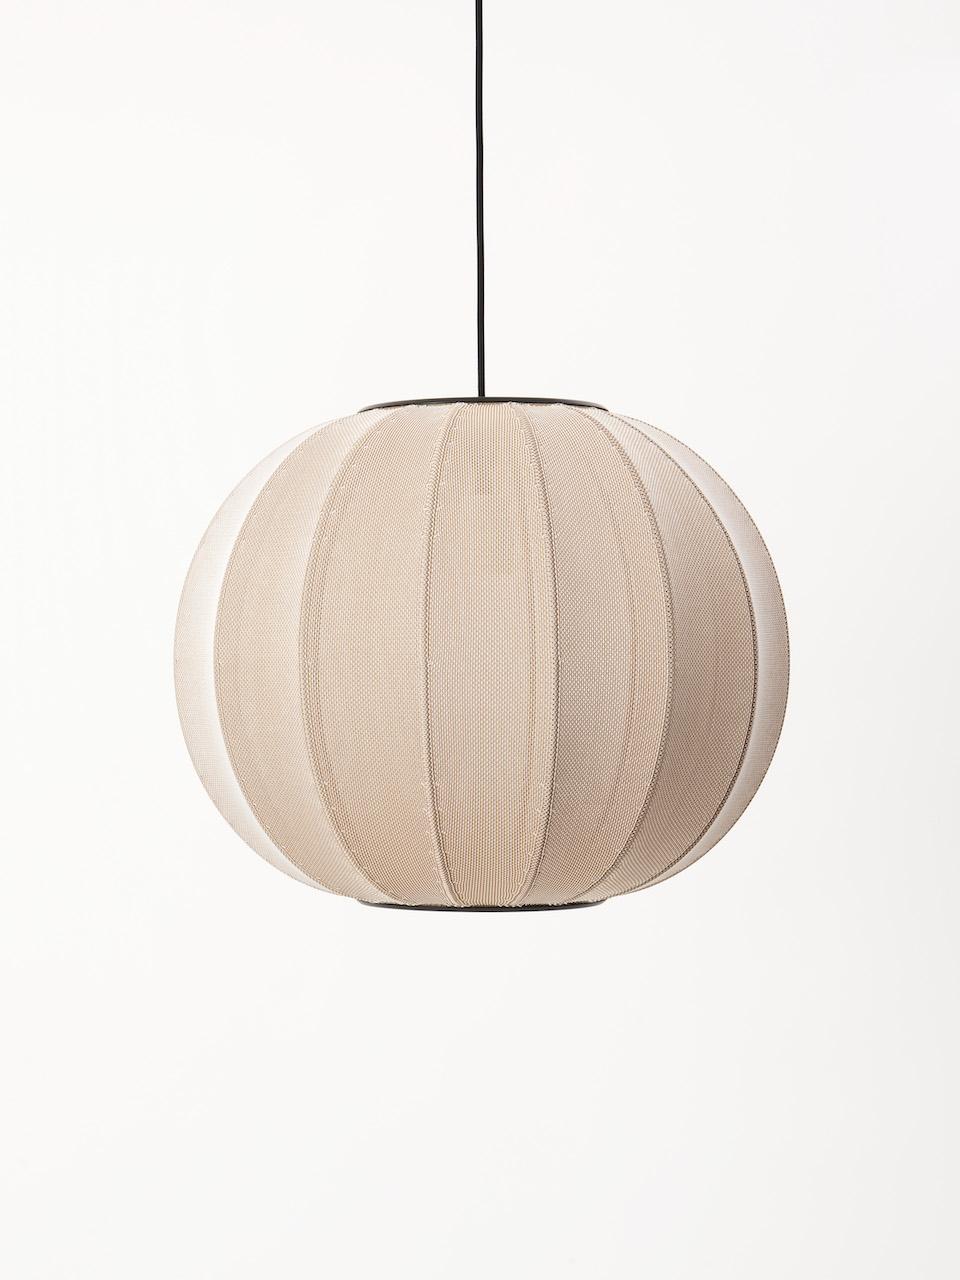 Made by Hand Knit Wit Pendelleuchte Sandstone ø45cm